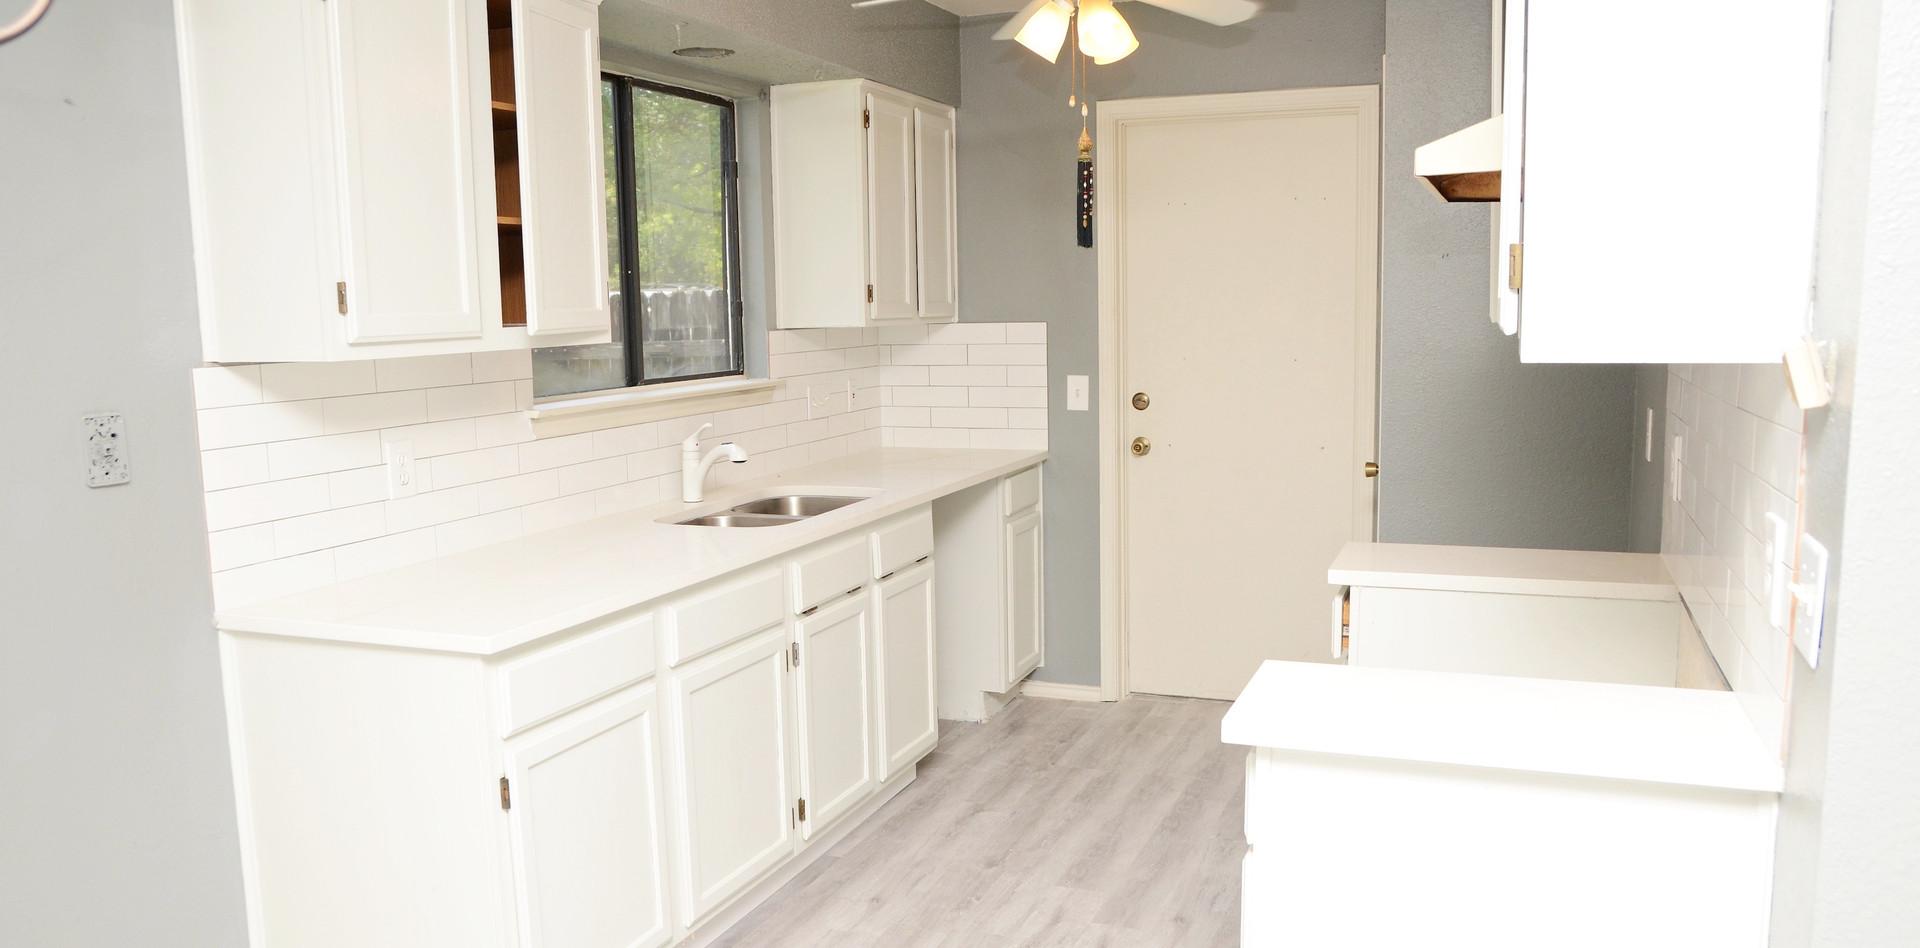 kitchen_remodel_1.JPG